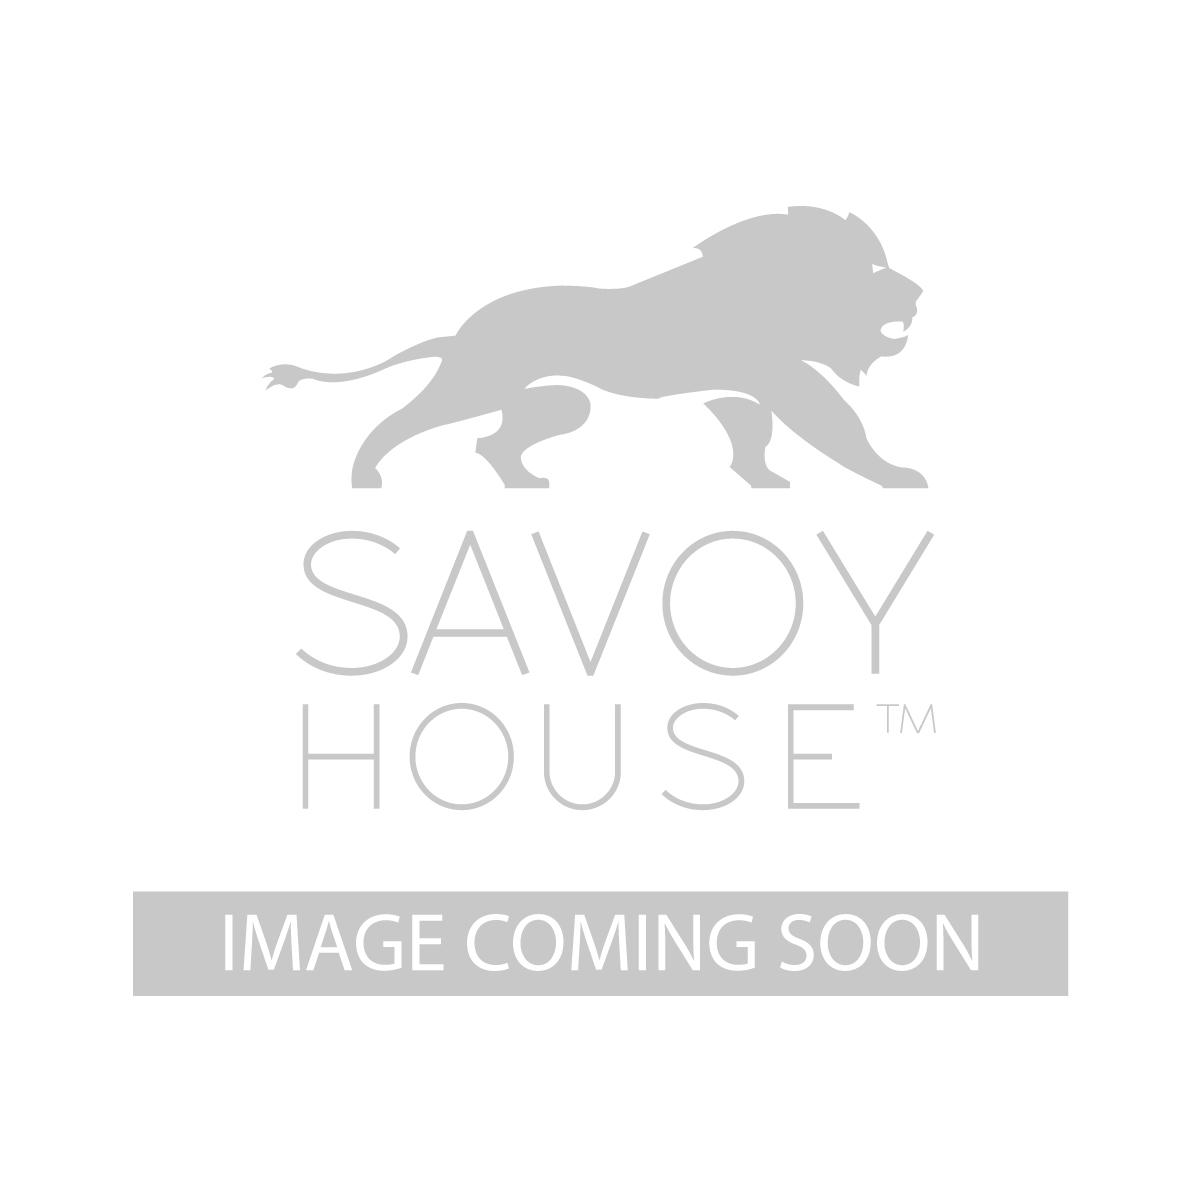 8-4658-3-69 Wilmont 3 Light Bath Bar by Savoy House